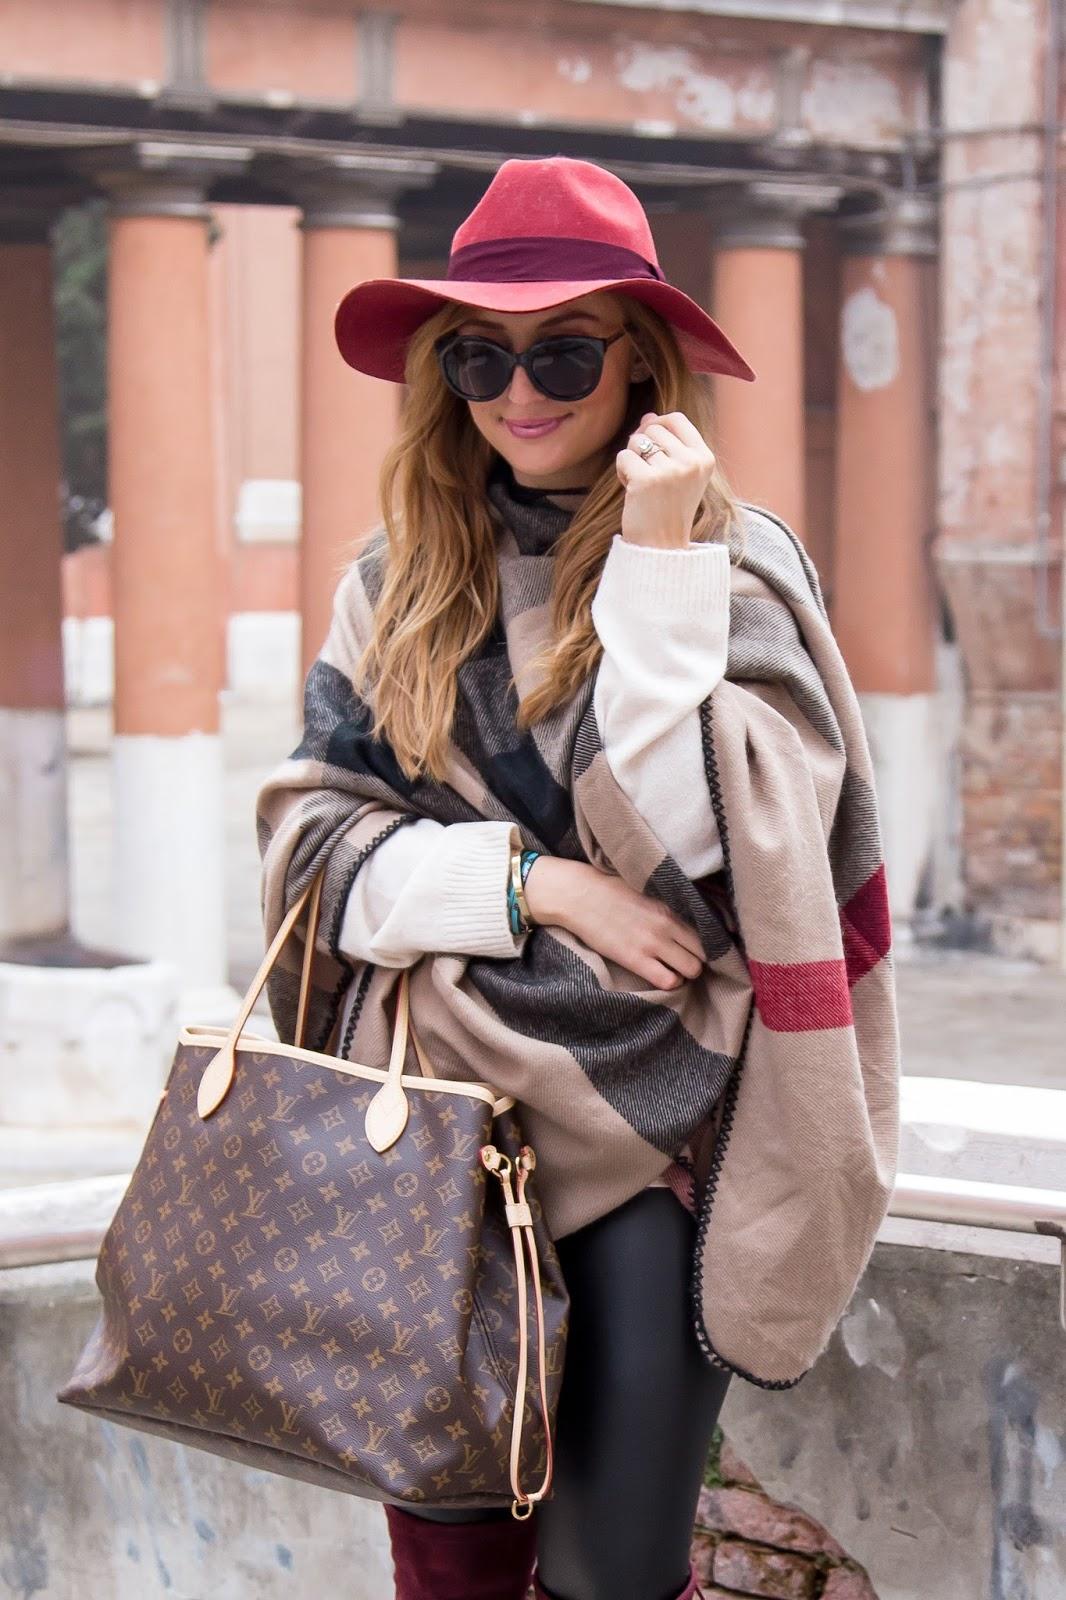 femininer-stil-femininer-look-burberry-poncho-klassich-weinroter-Hut-fedora-hut-louis-vuitton-tasche-neverfull-gm-tache-was-trage-ich-im-winter-winter-outfits-fashionblogger-blogger-style-im-winte